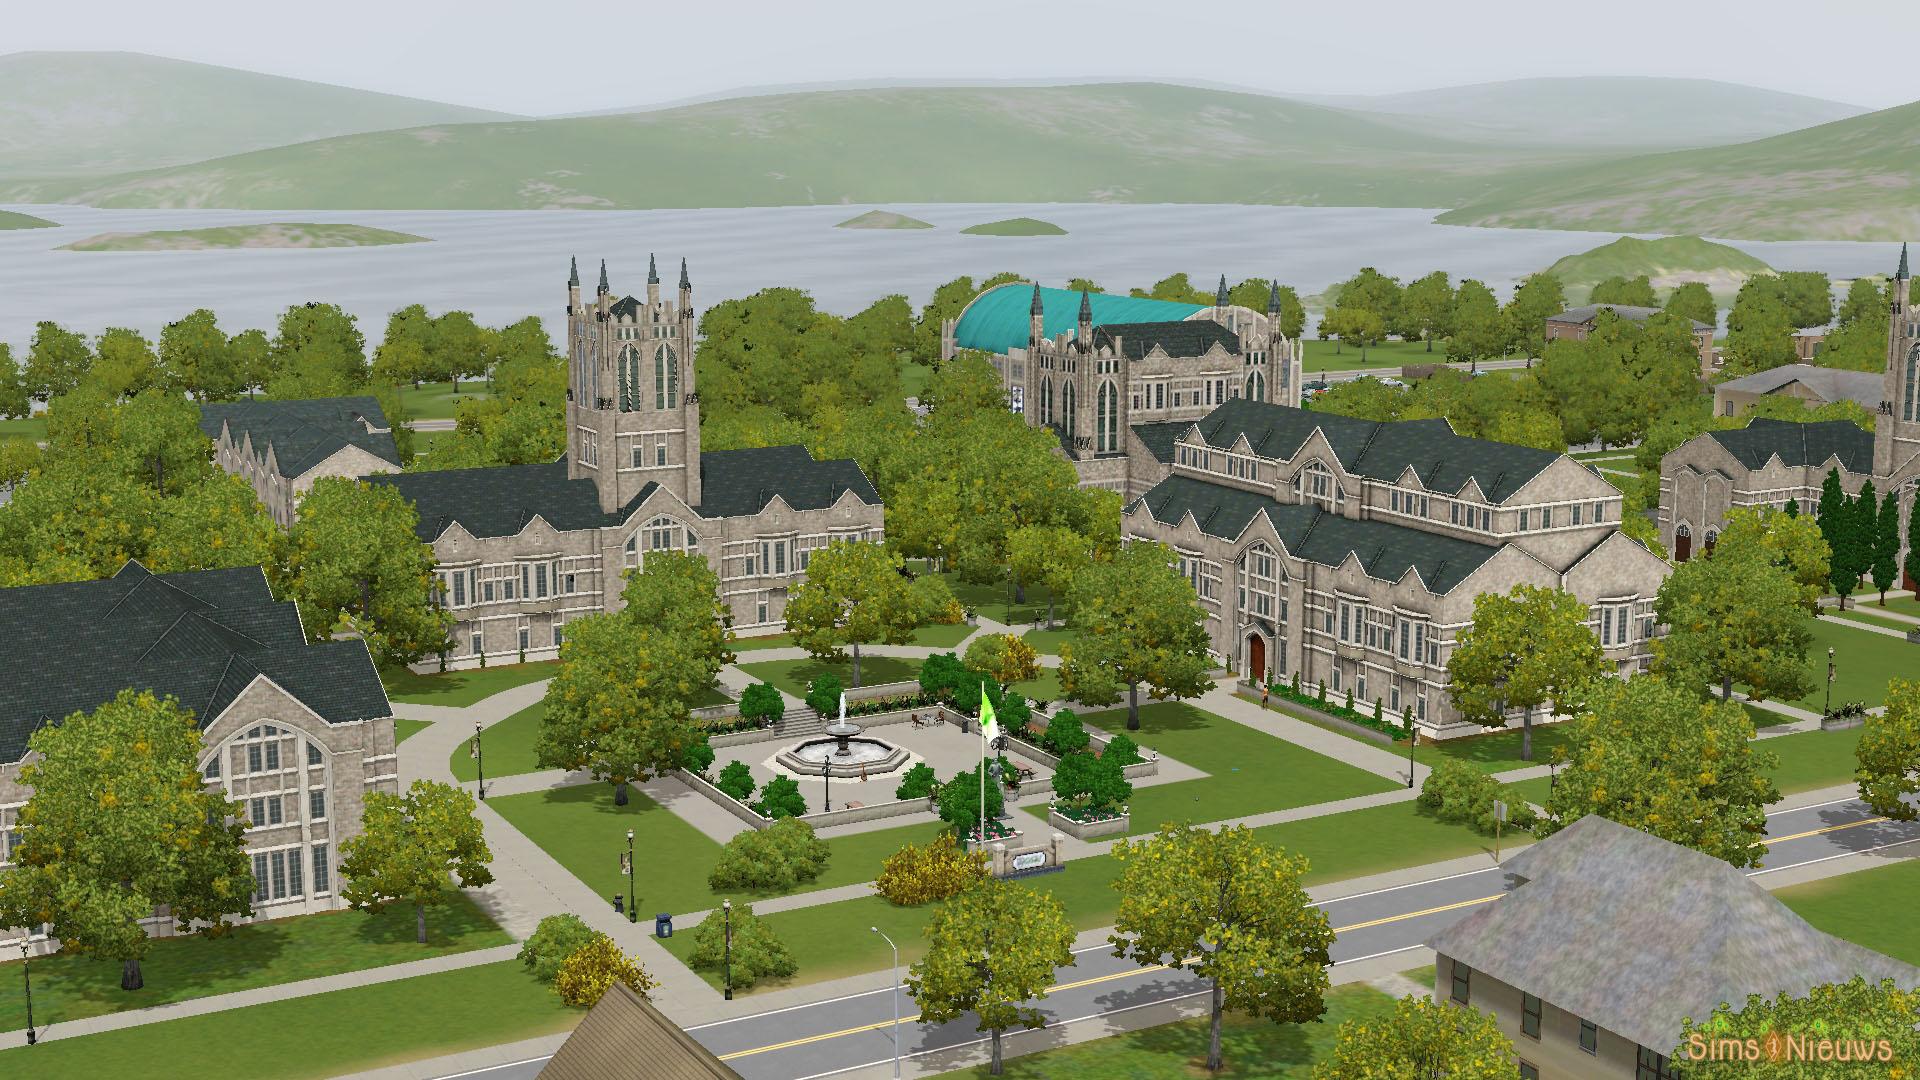 SN Preview: De Sims 3 Studententijd